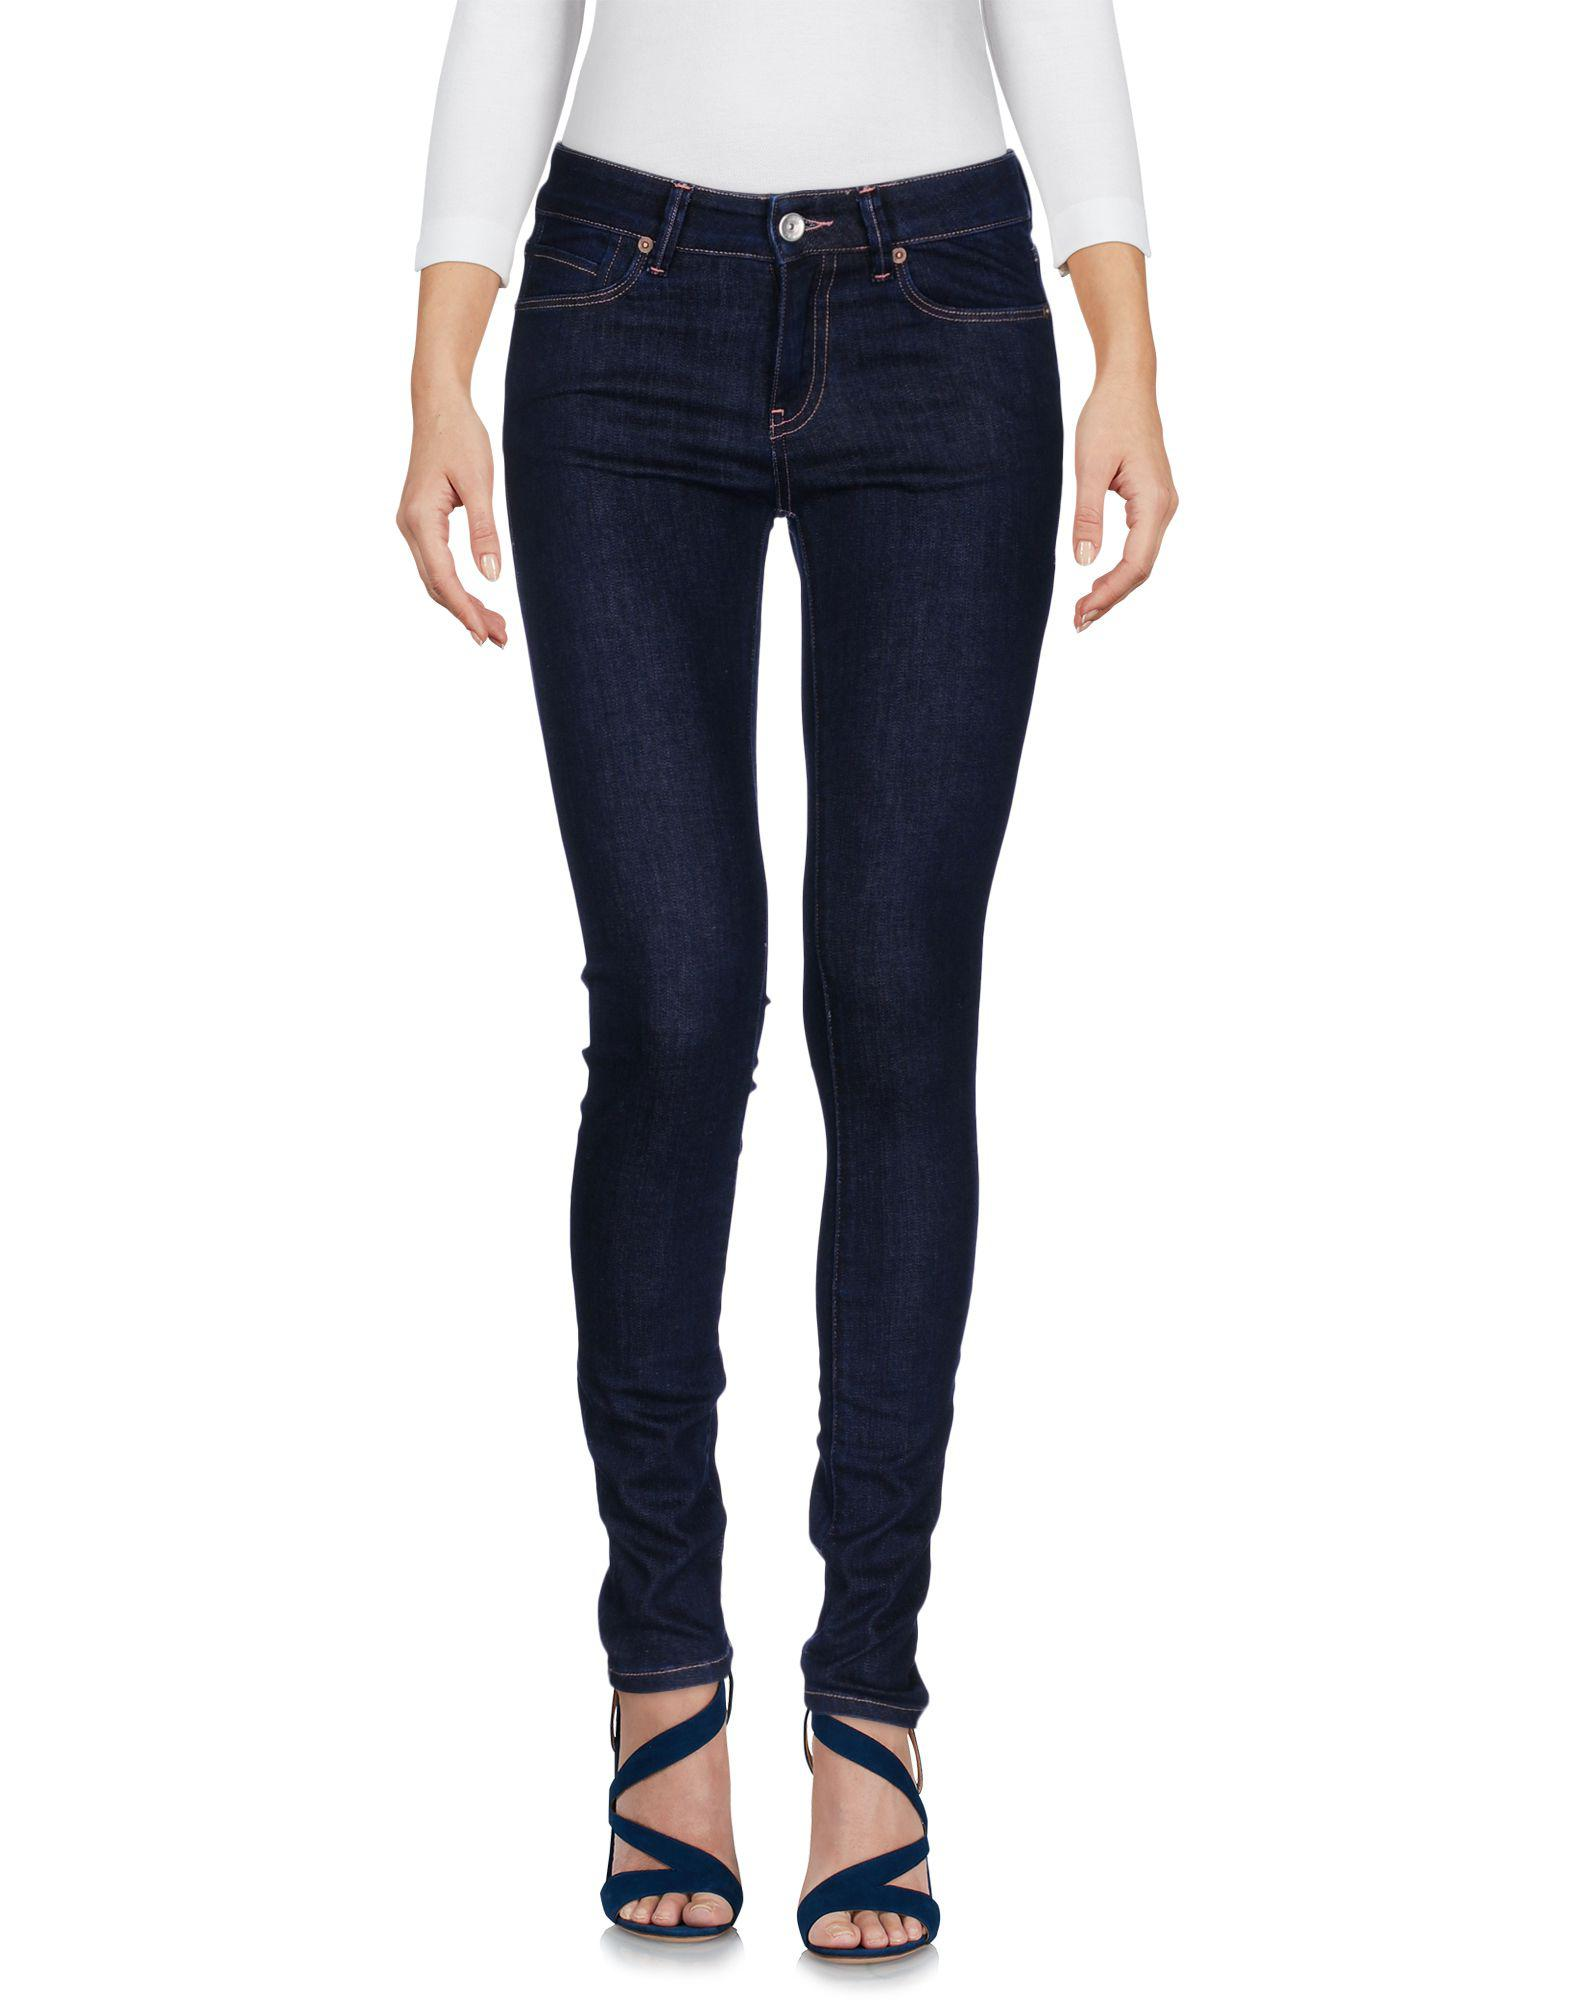 DENIM - Denim trousers Fairly 2zPOcWWV7